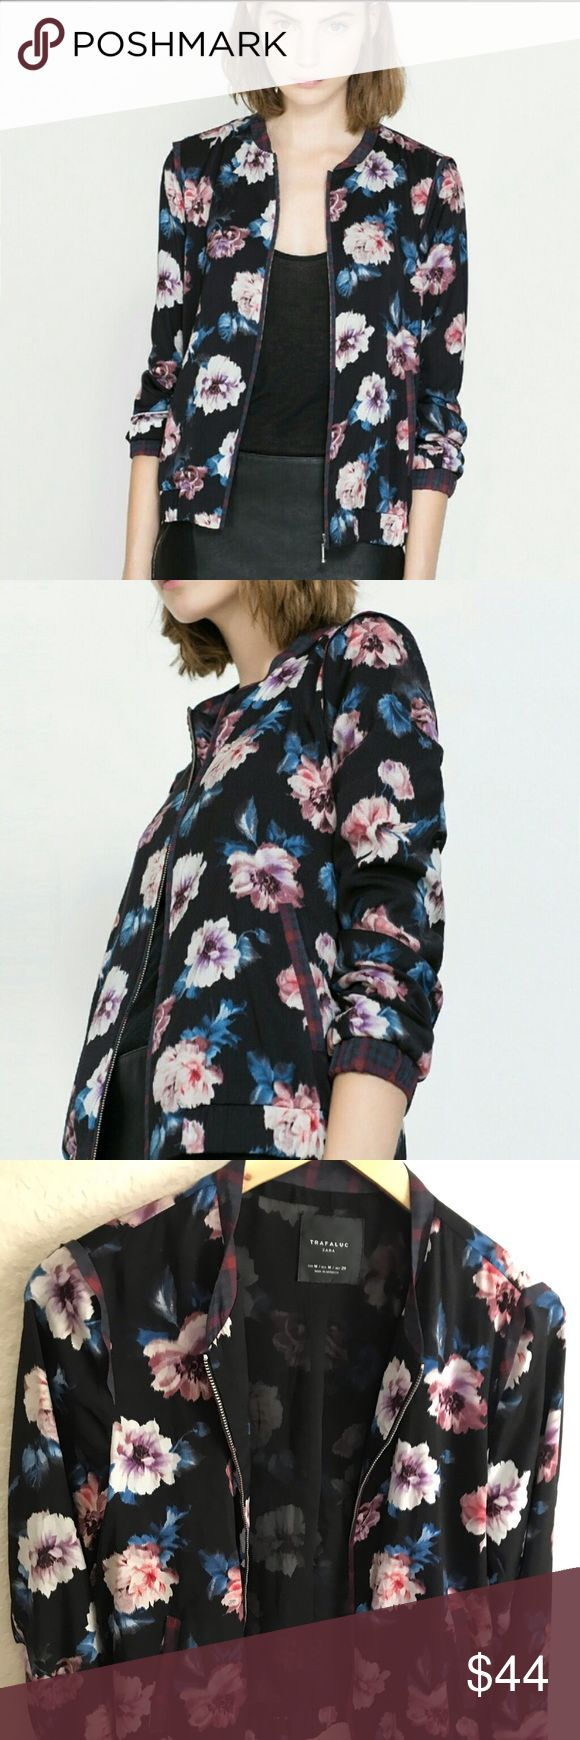 Zara Floral Jacket Floral jacket, Floral bomber jacket